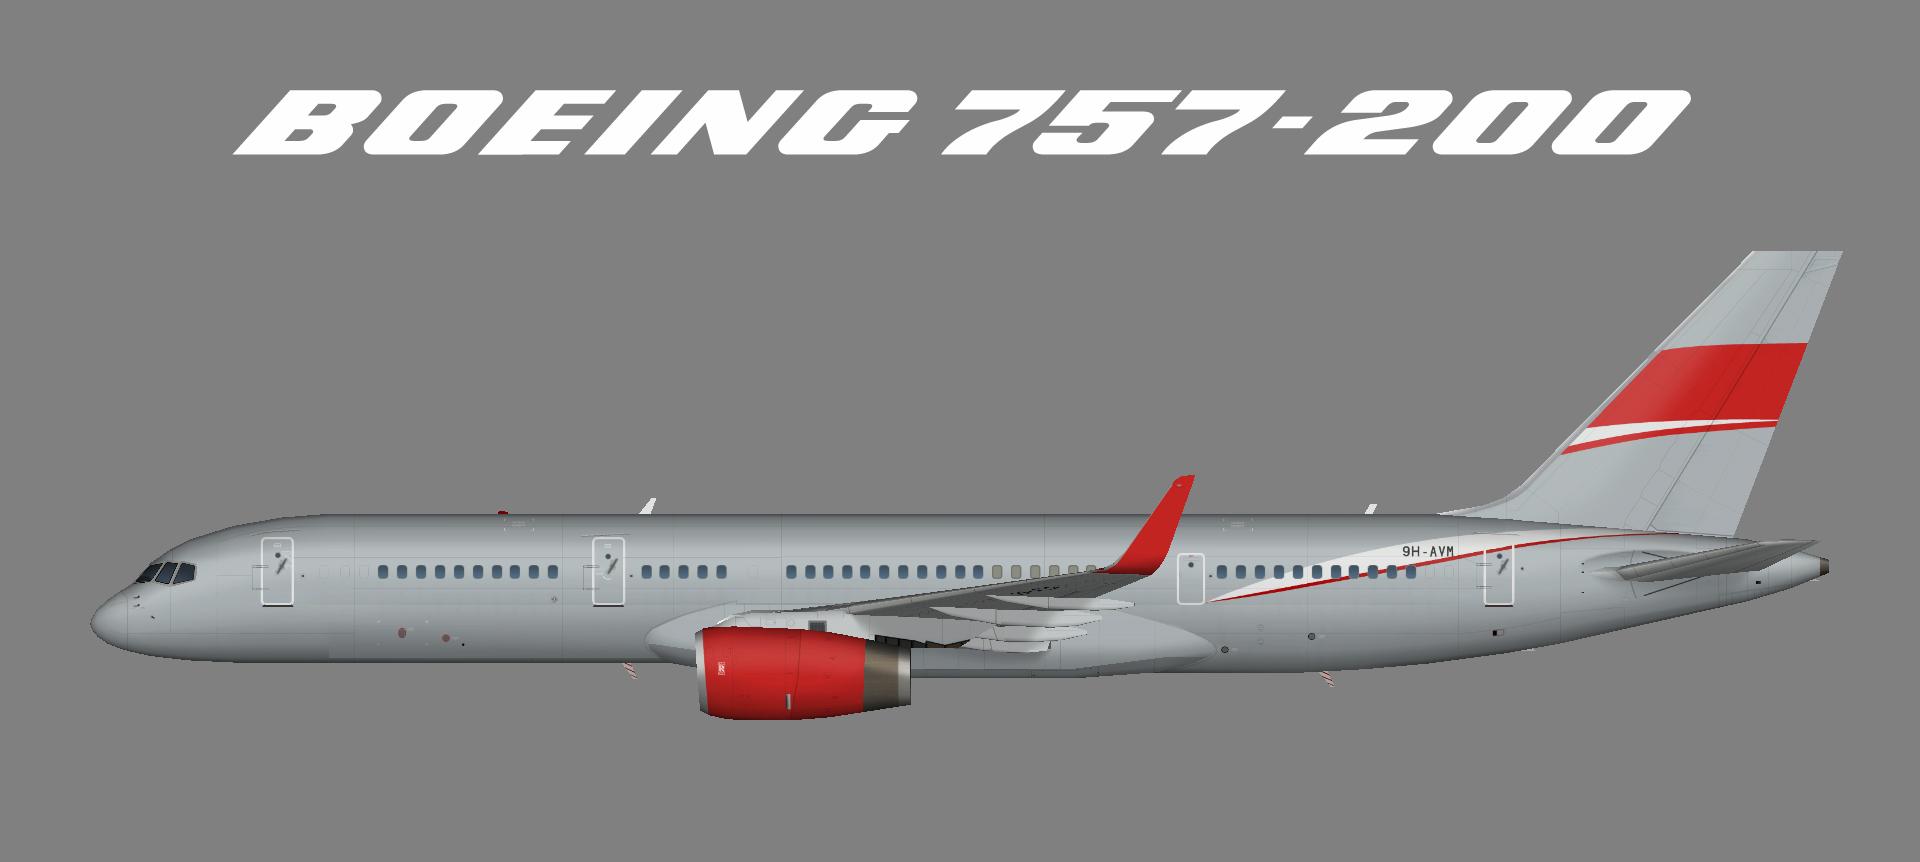 JetMagic 757-200